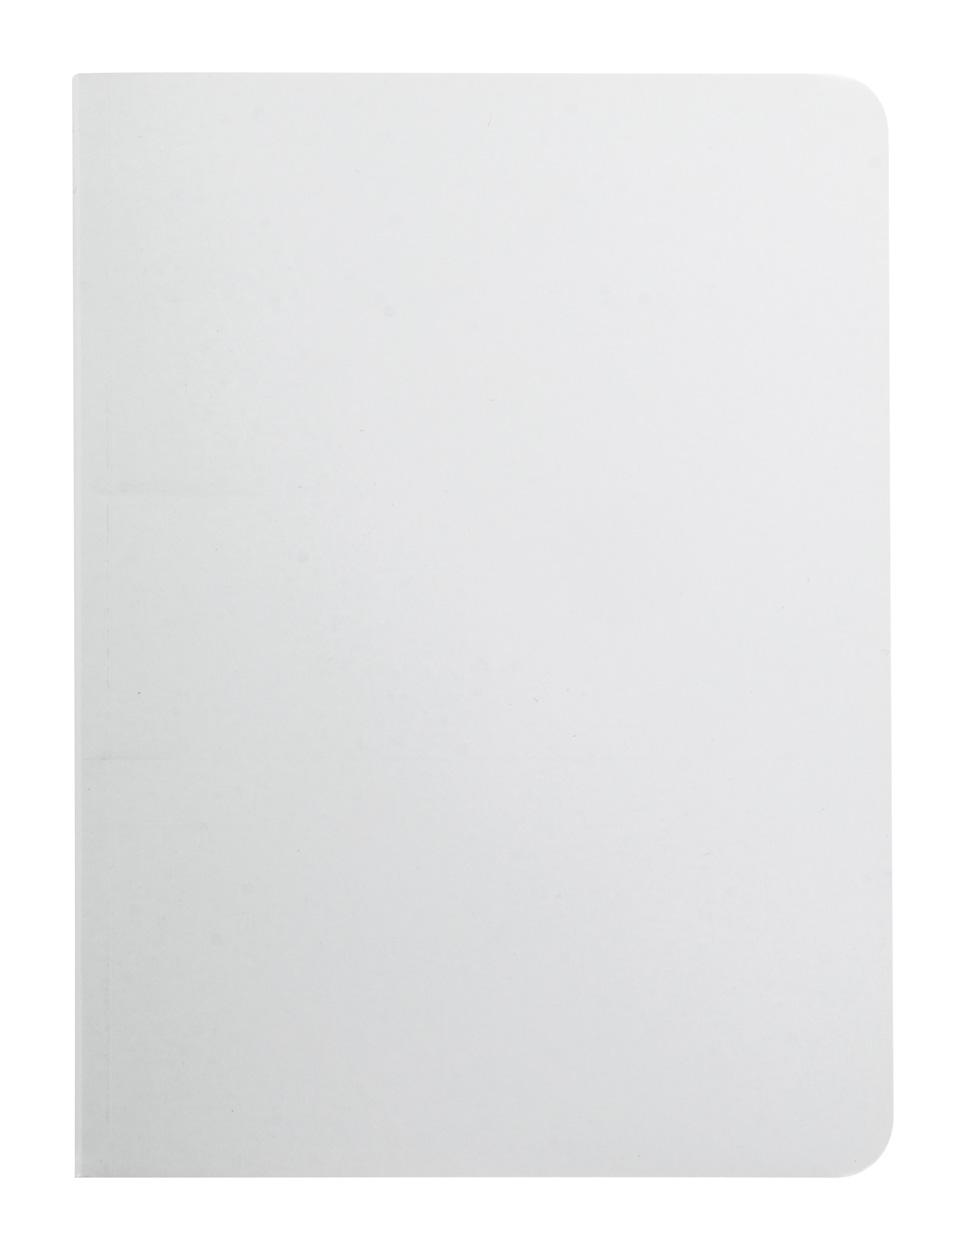 AP721765-01